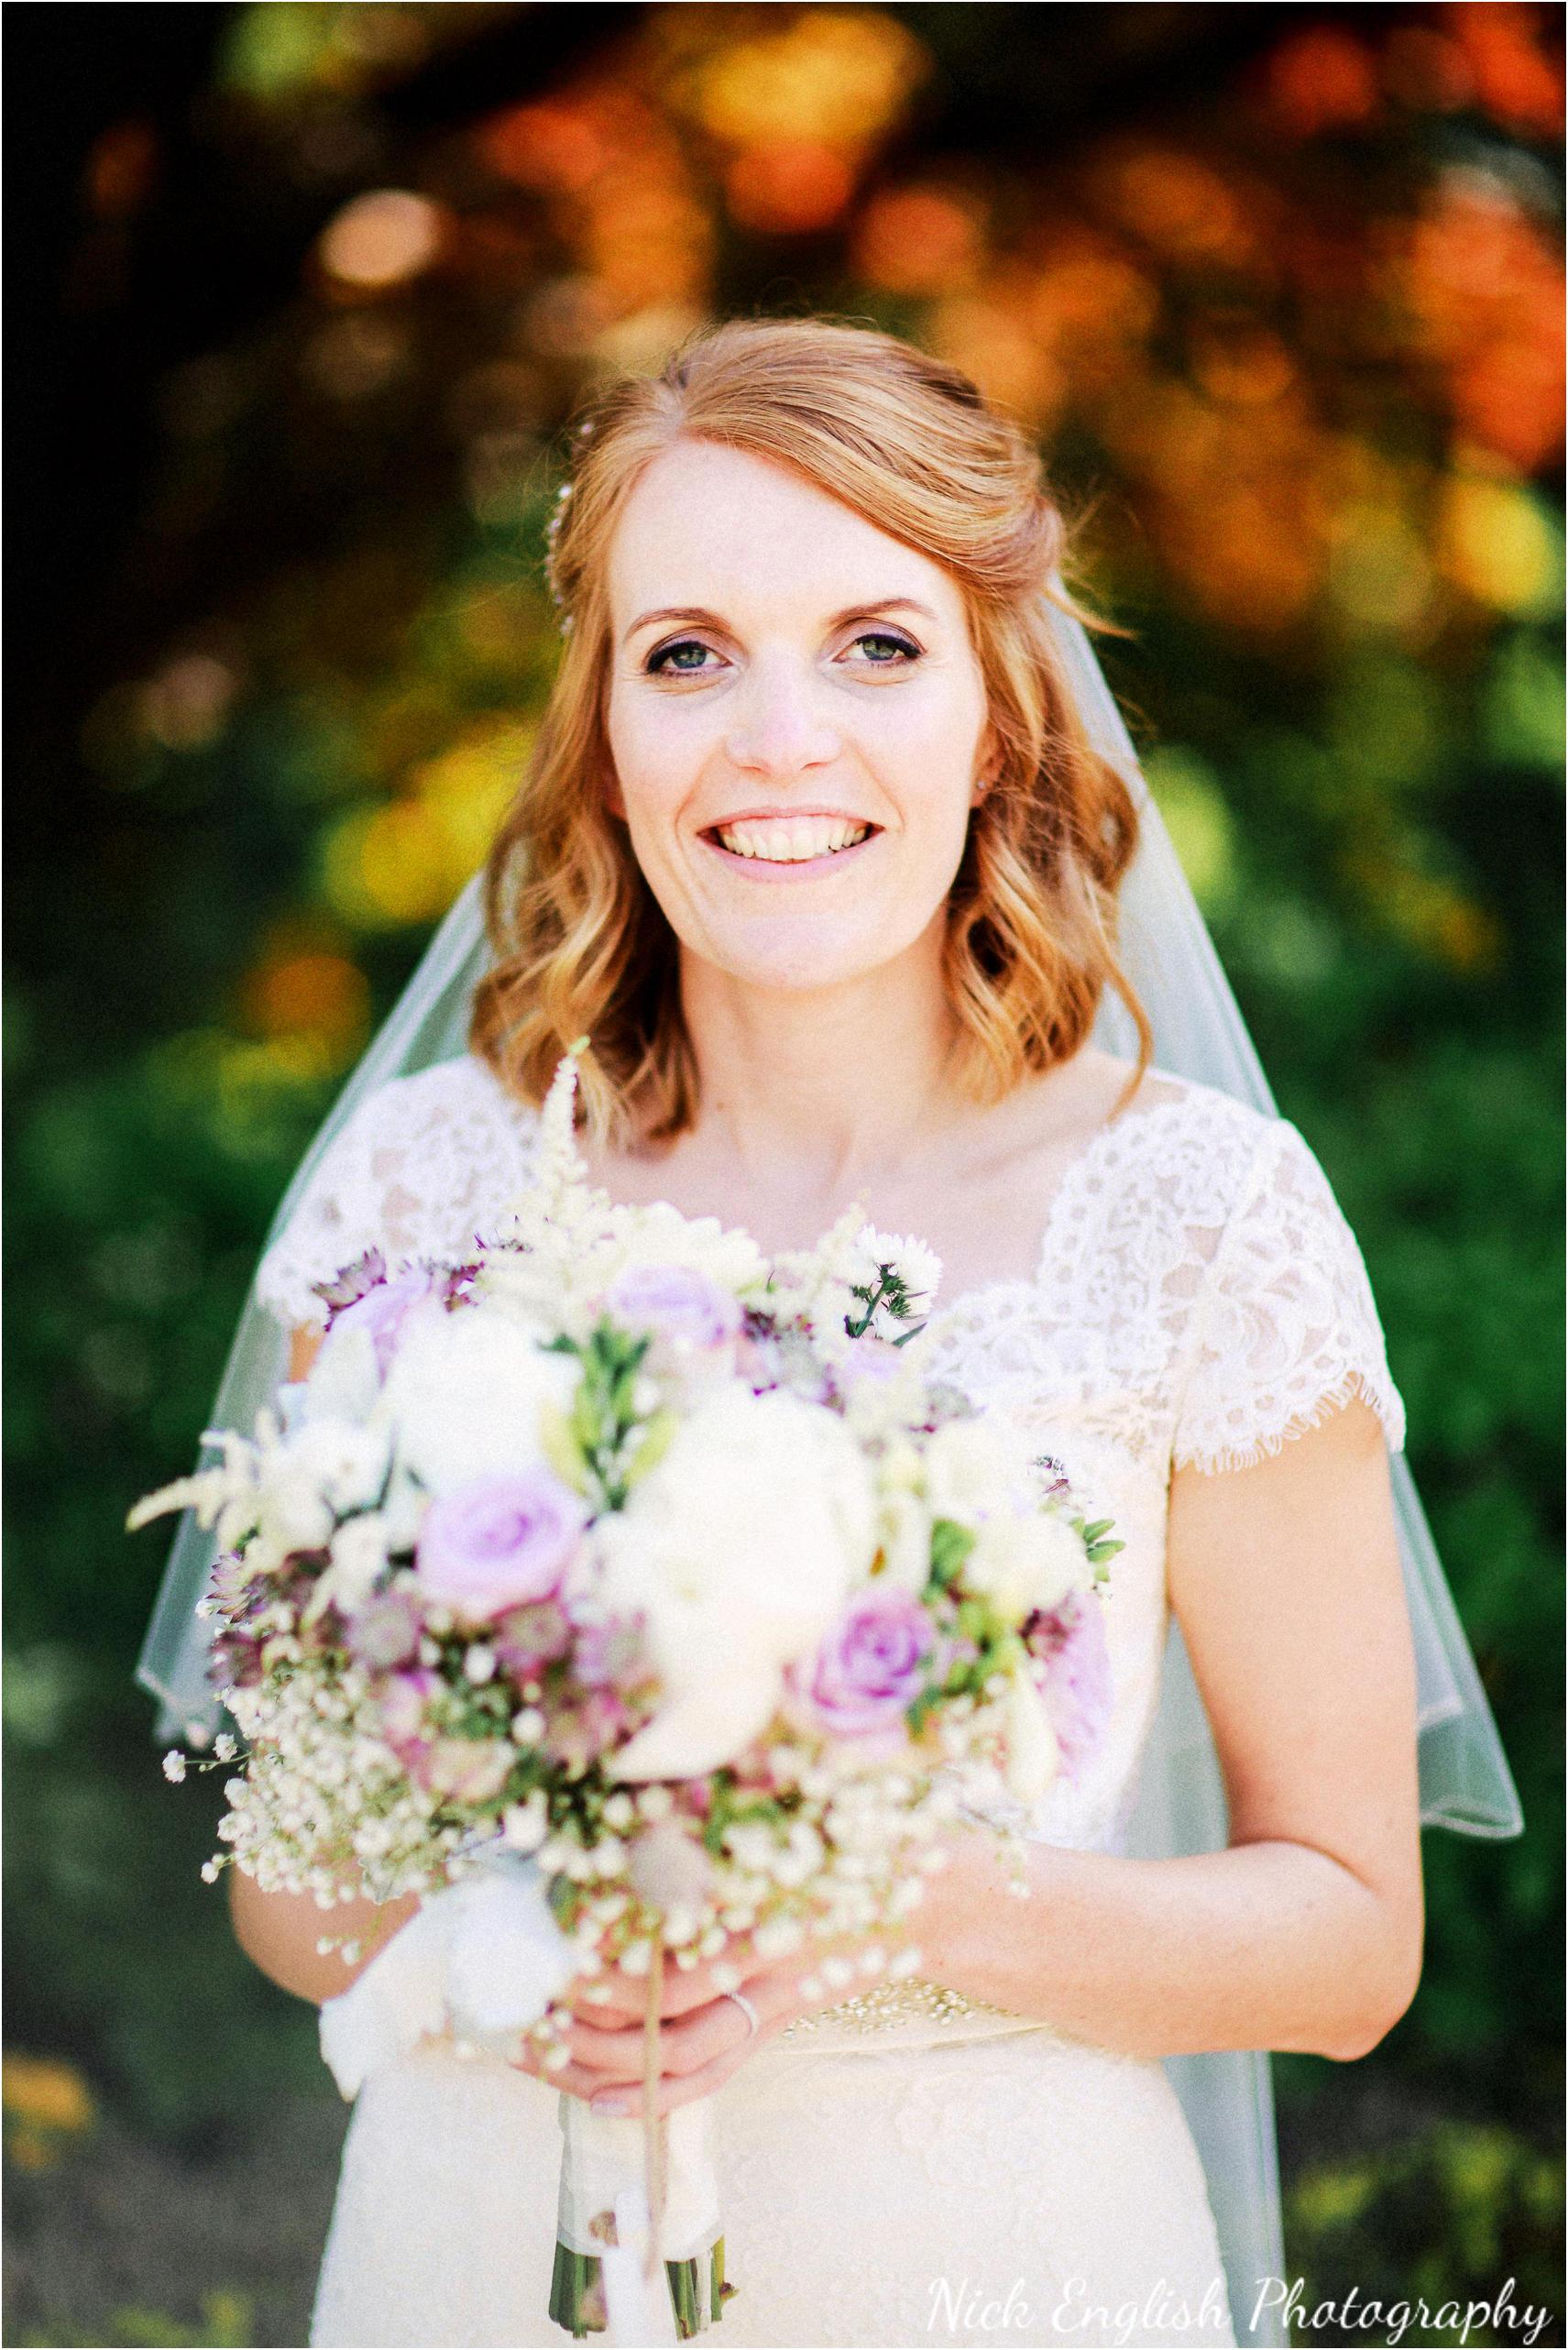 Alison James Wedding Photographs at Eaves Hall West Bradford 142jpg.jpeg